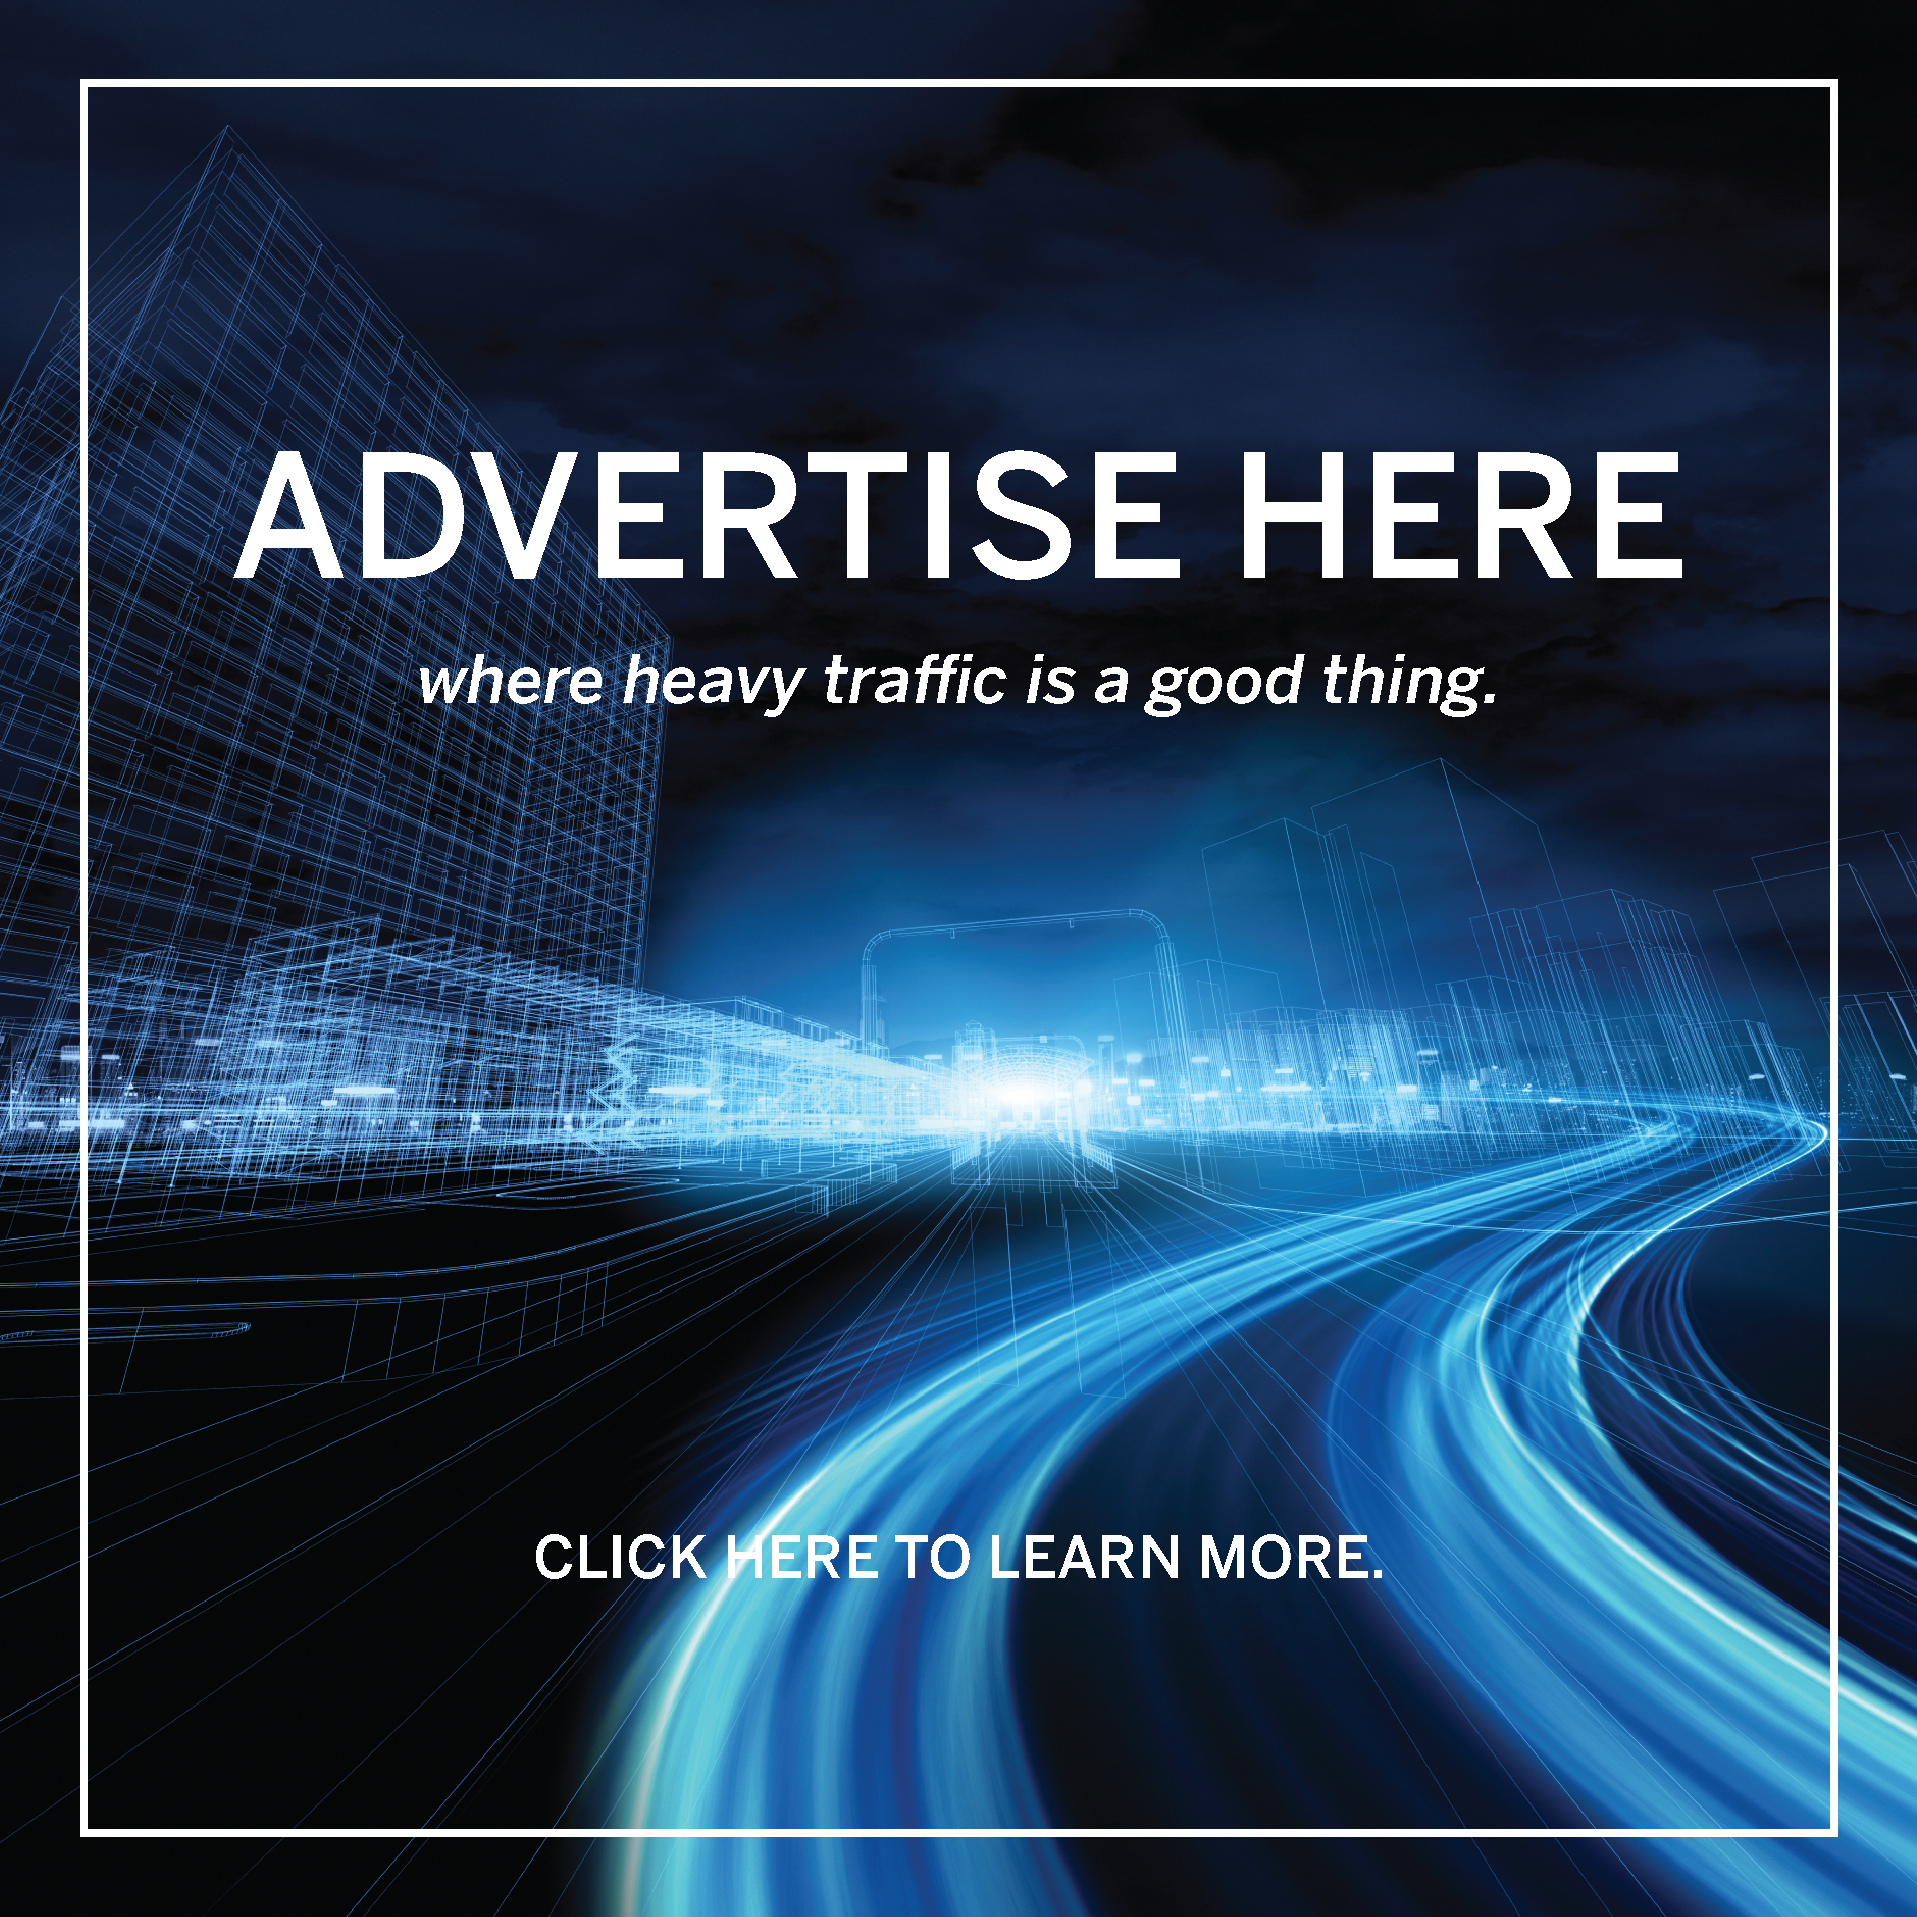 Test Ad